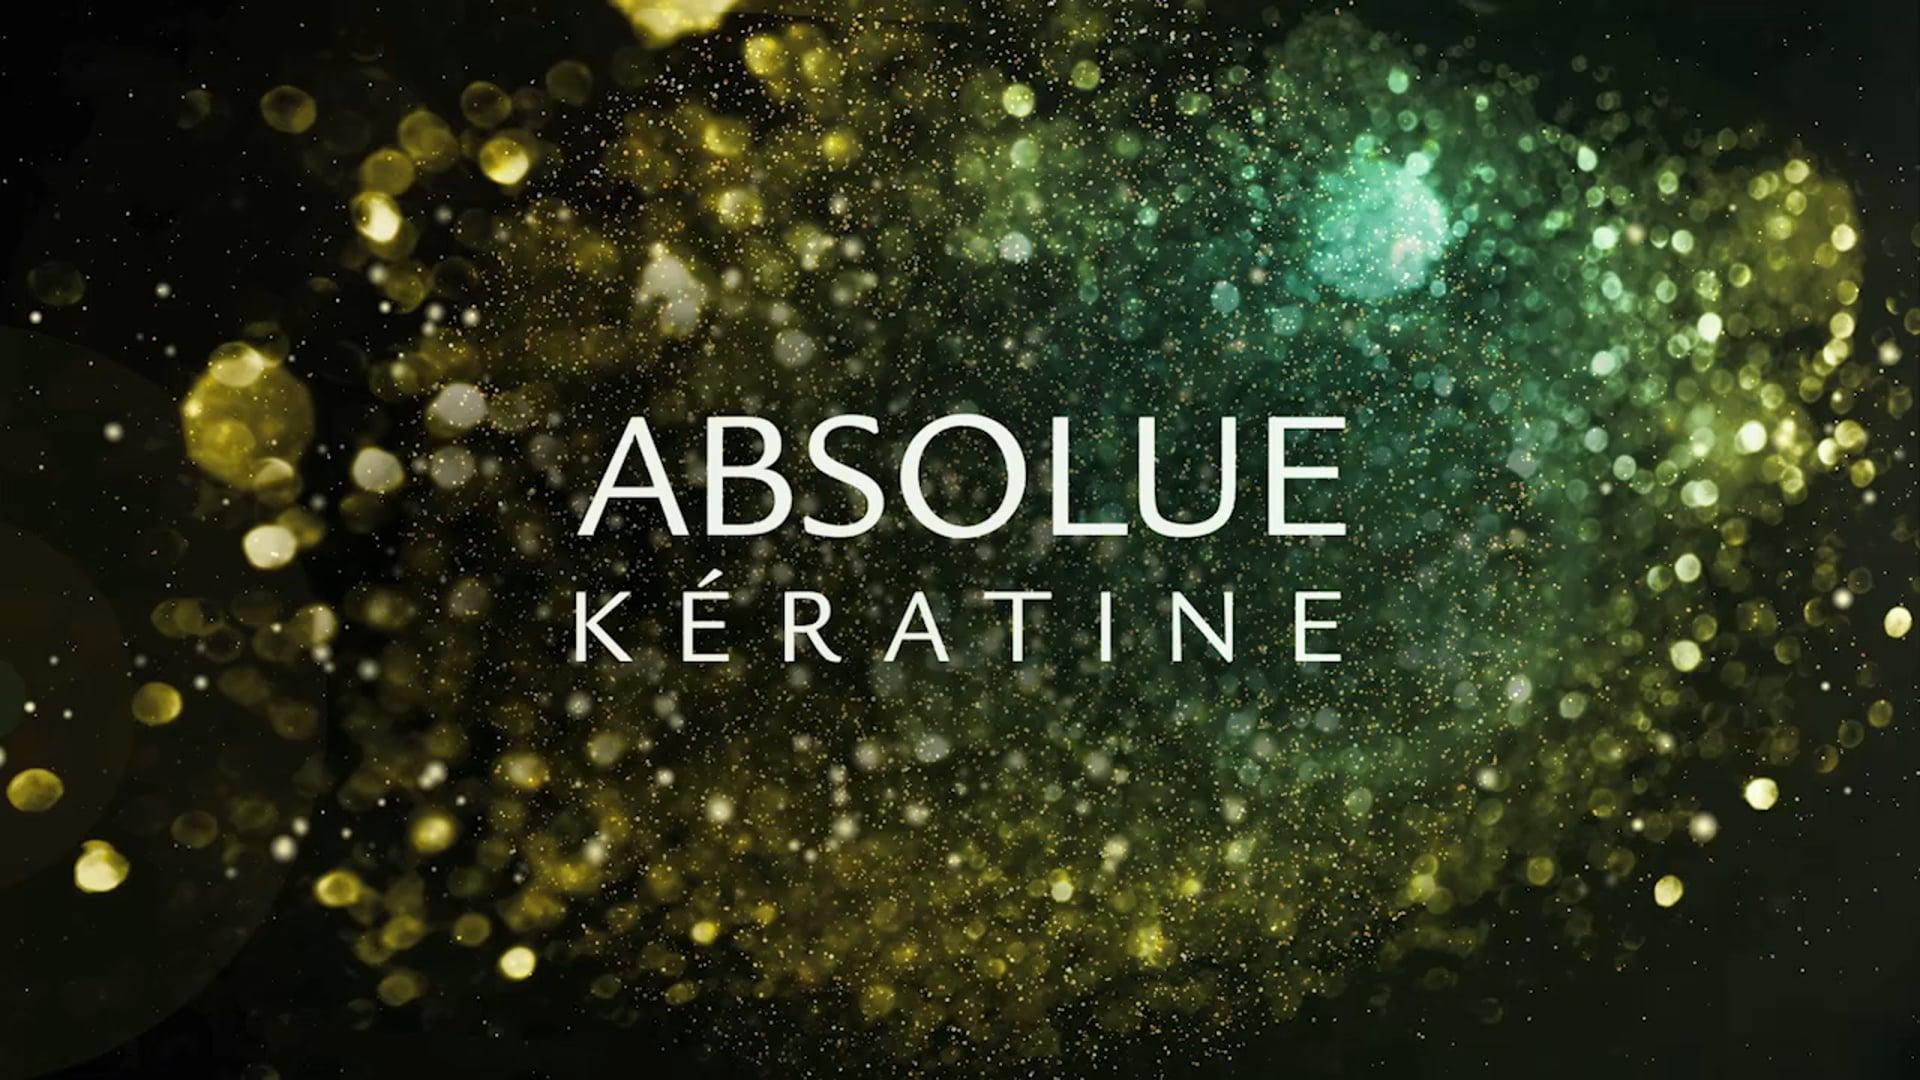 ABSOLUE KERATINE